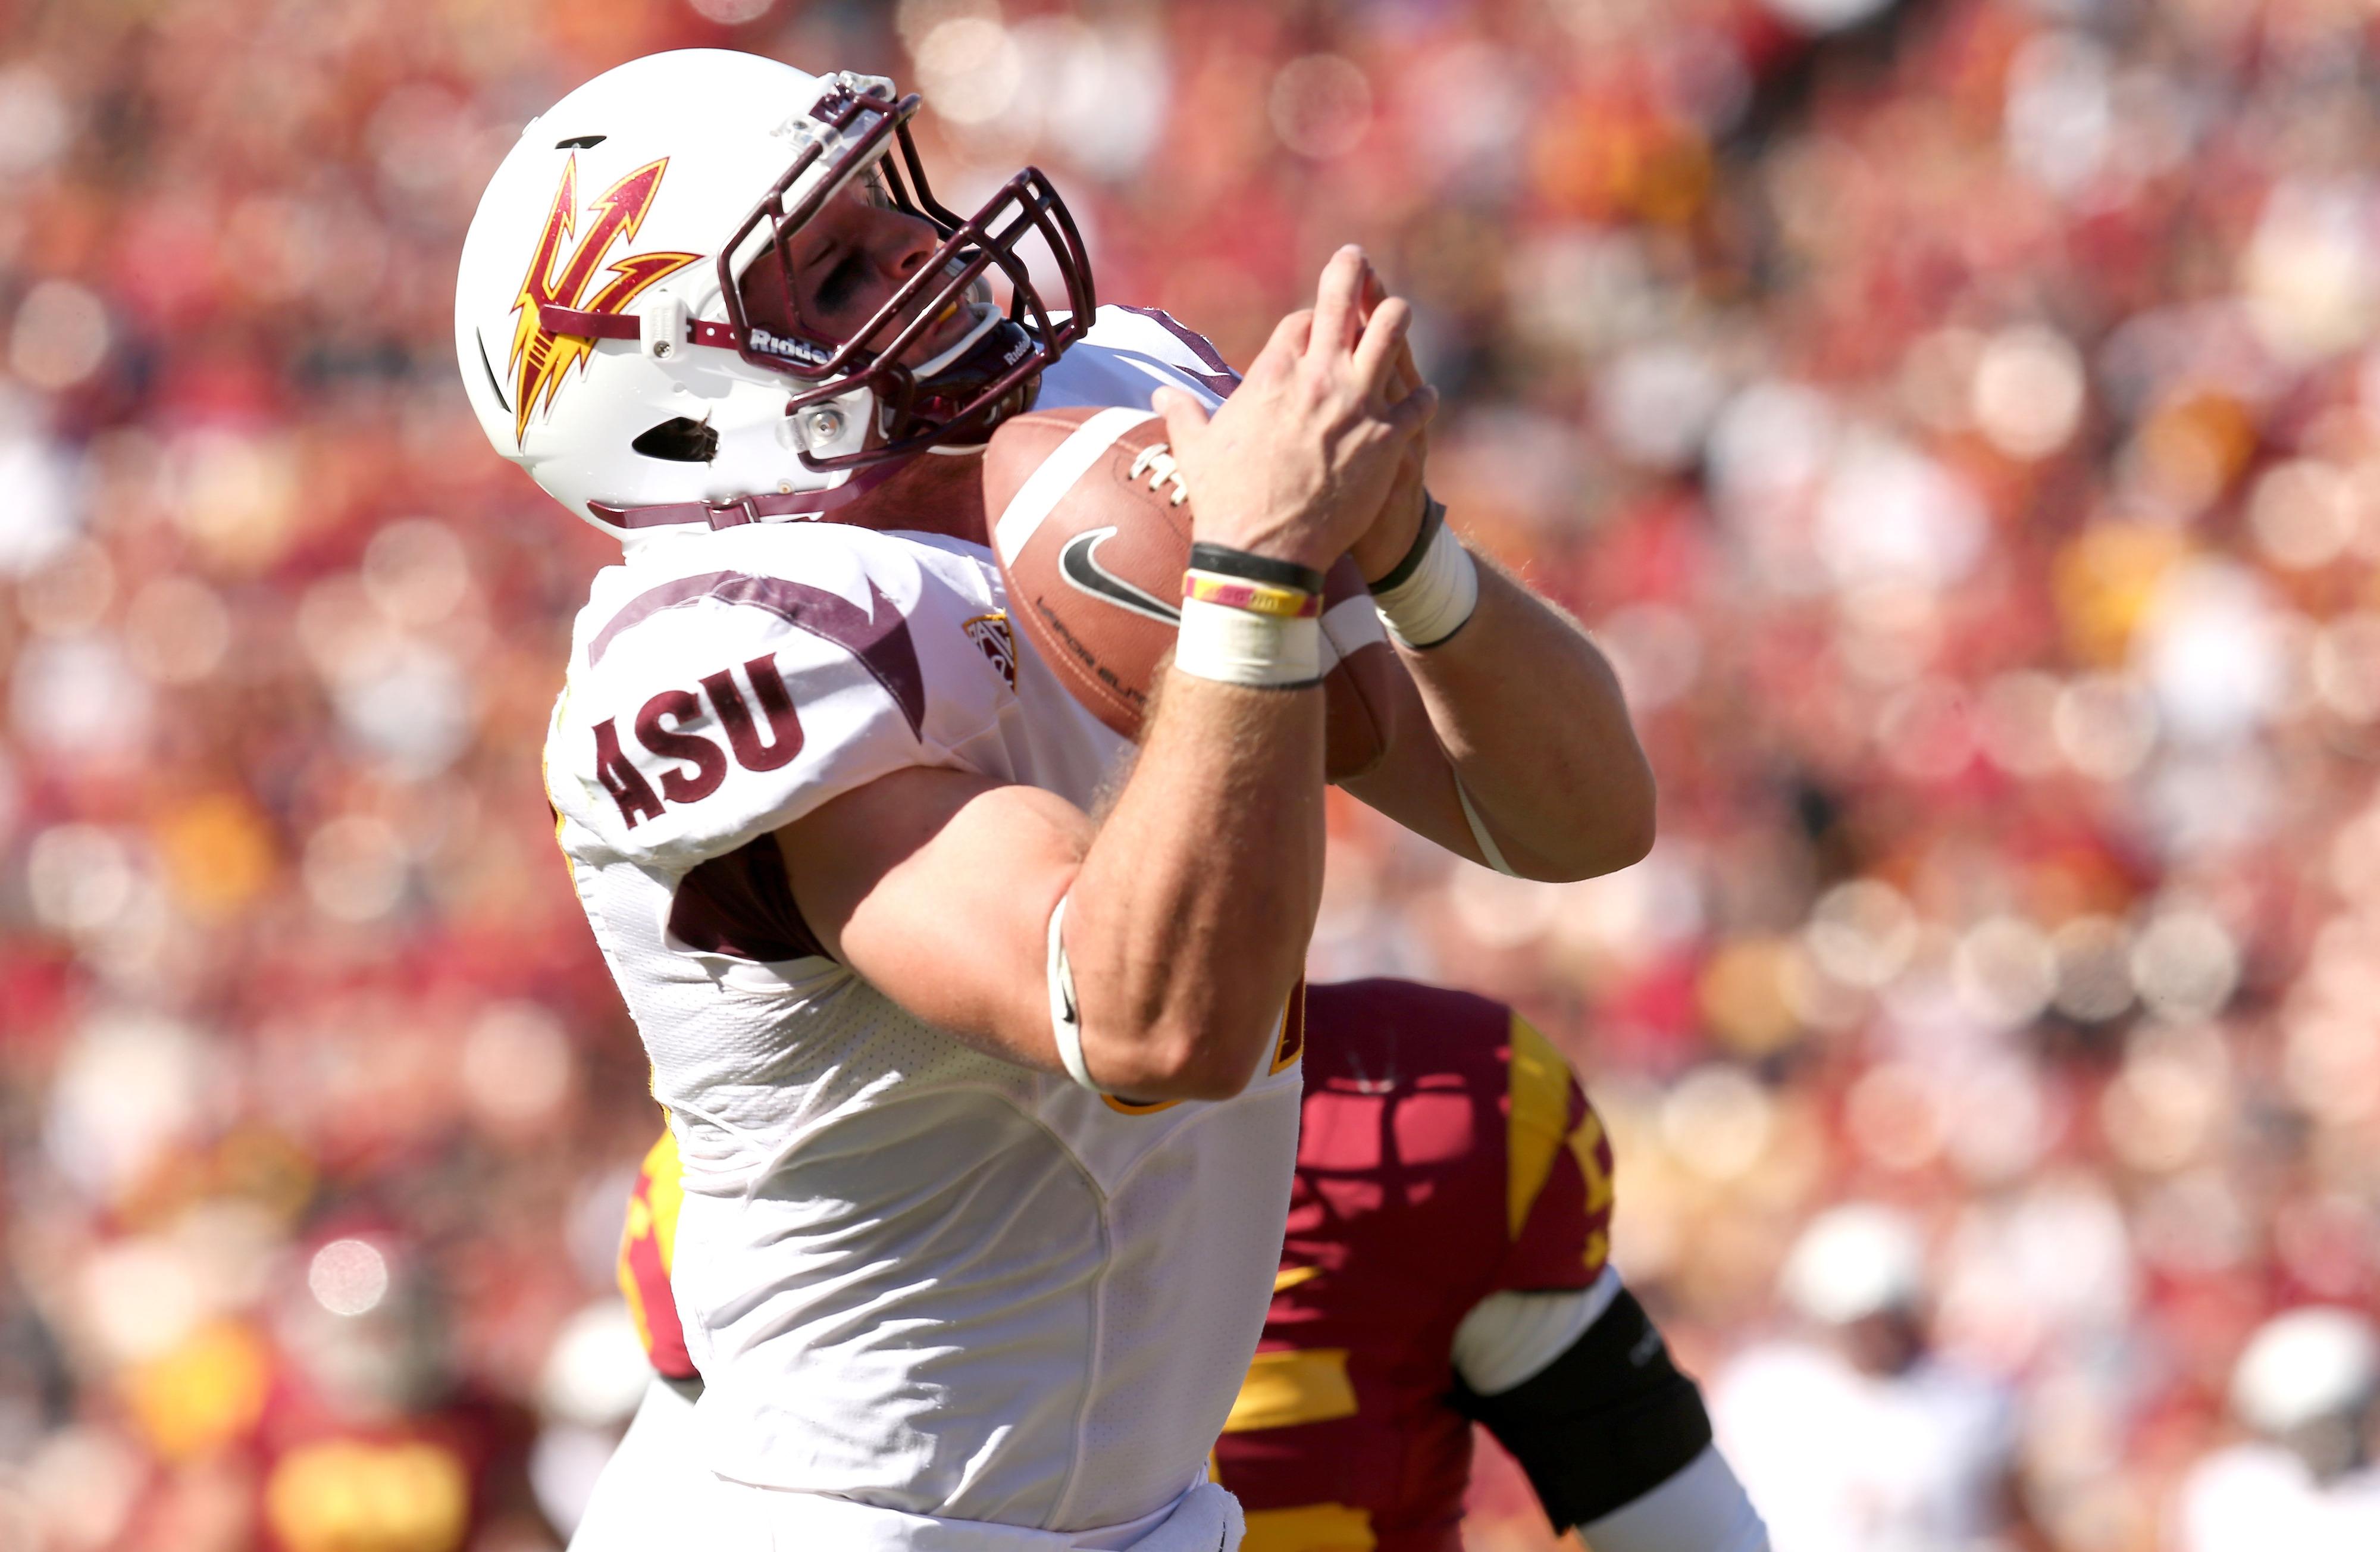 Chris Coyle hauls in a touchdown against USC